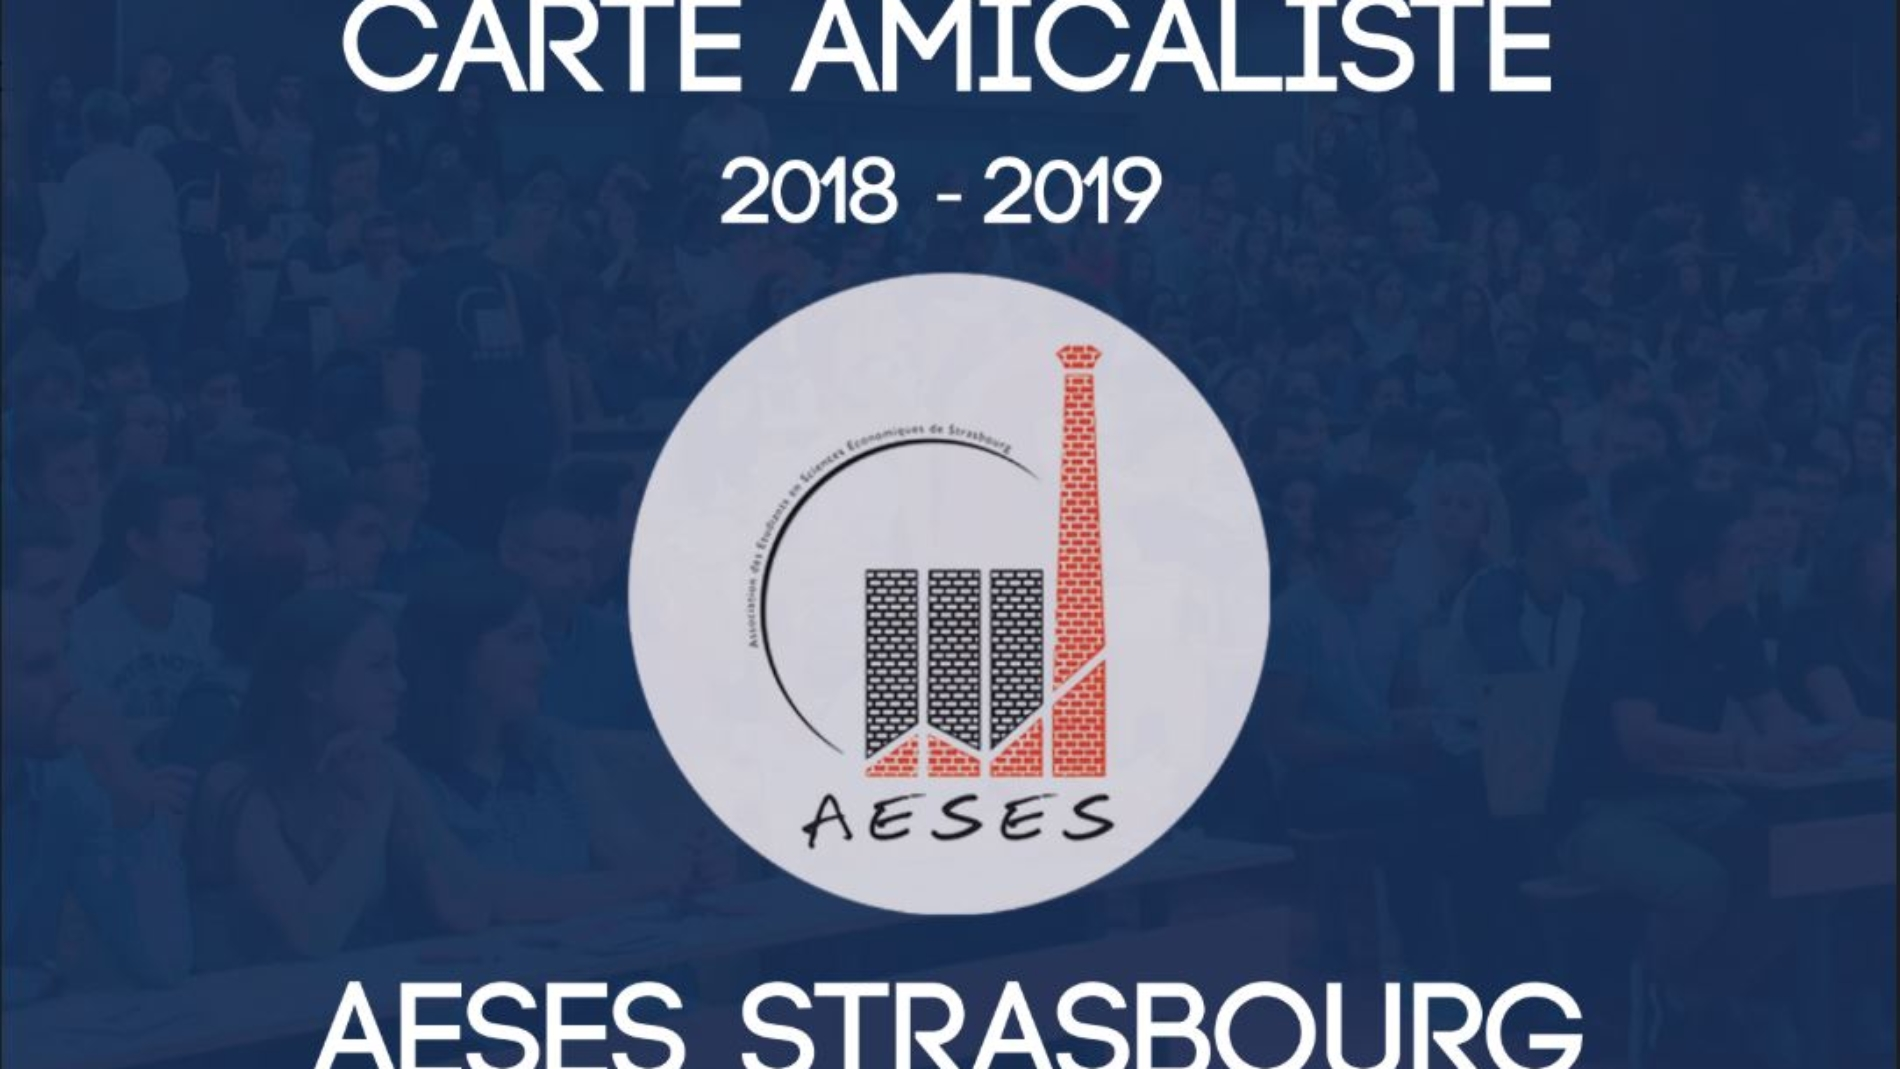 carte amicaliste 2018 2019